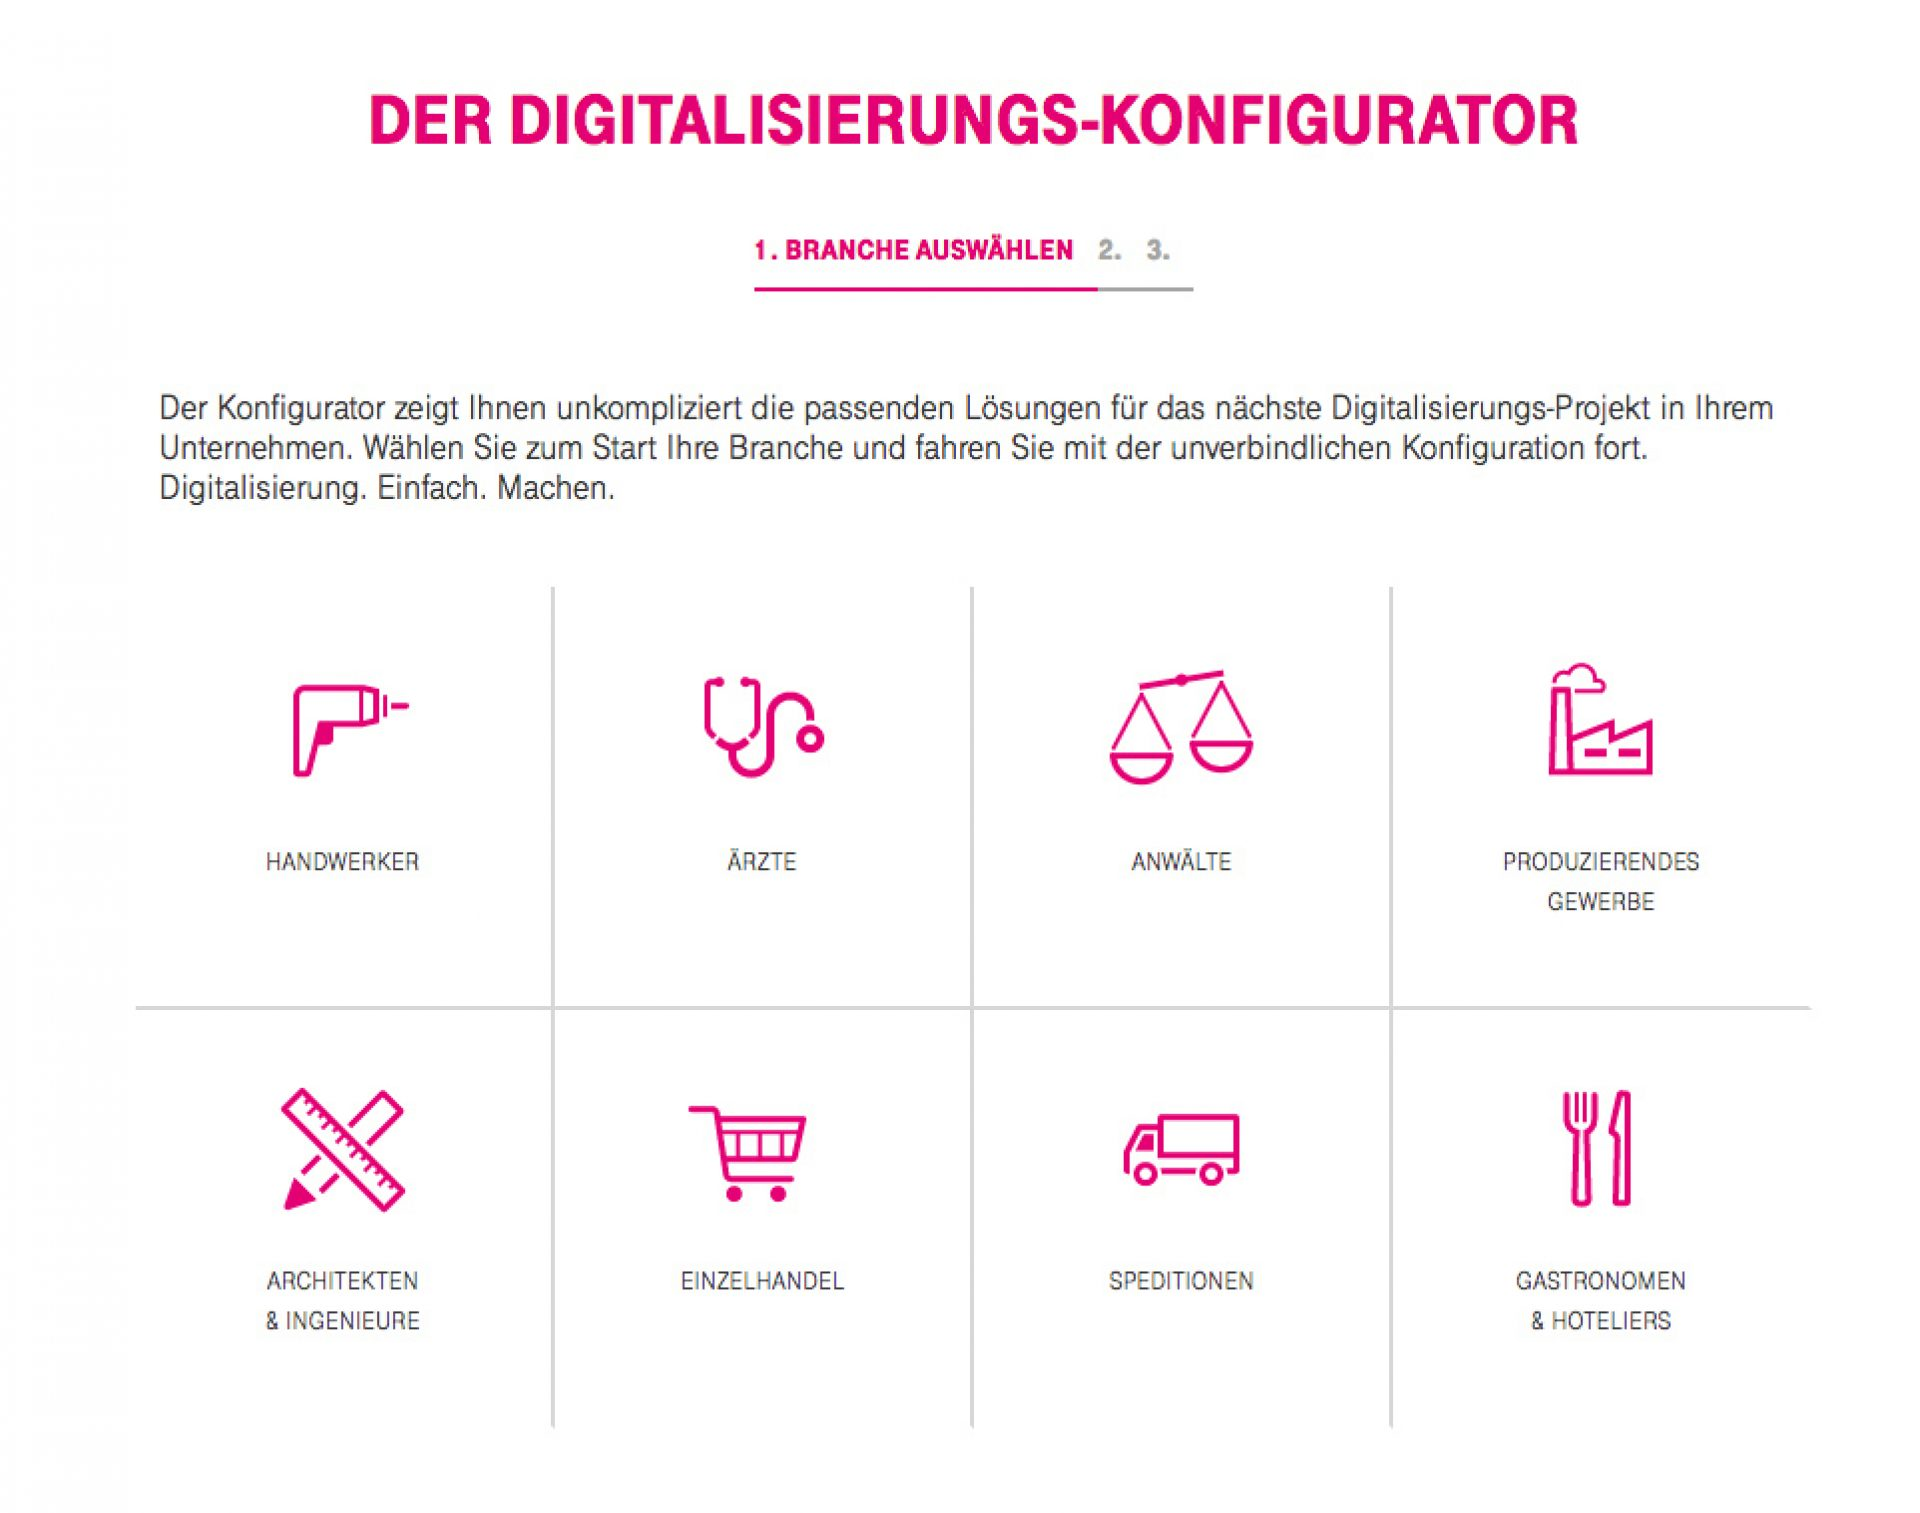 Fischer Appelt Telekom Digitalsierungs Konfigurator